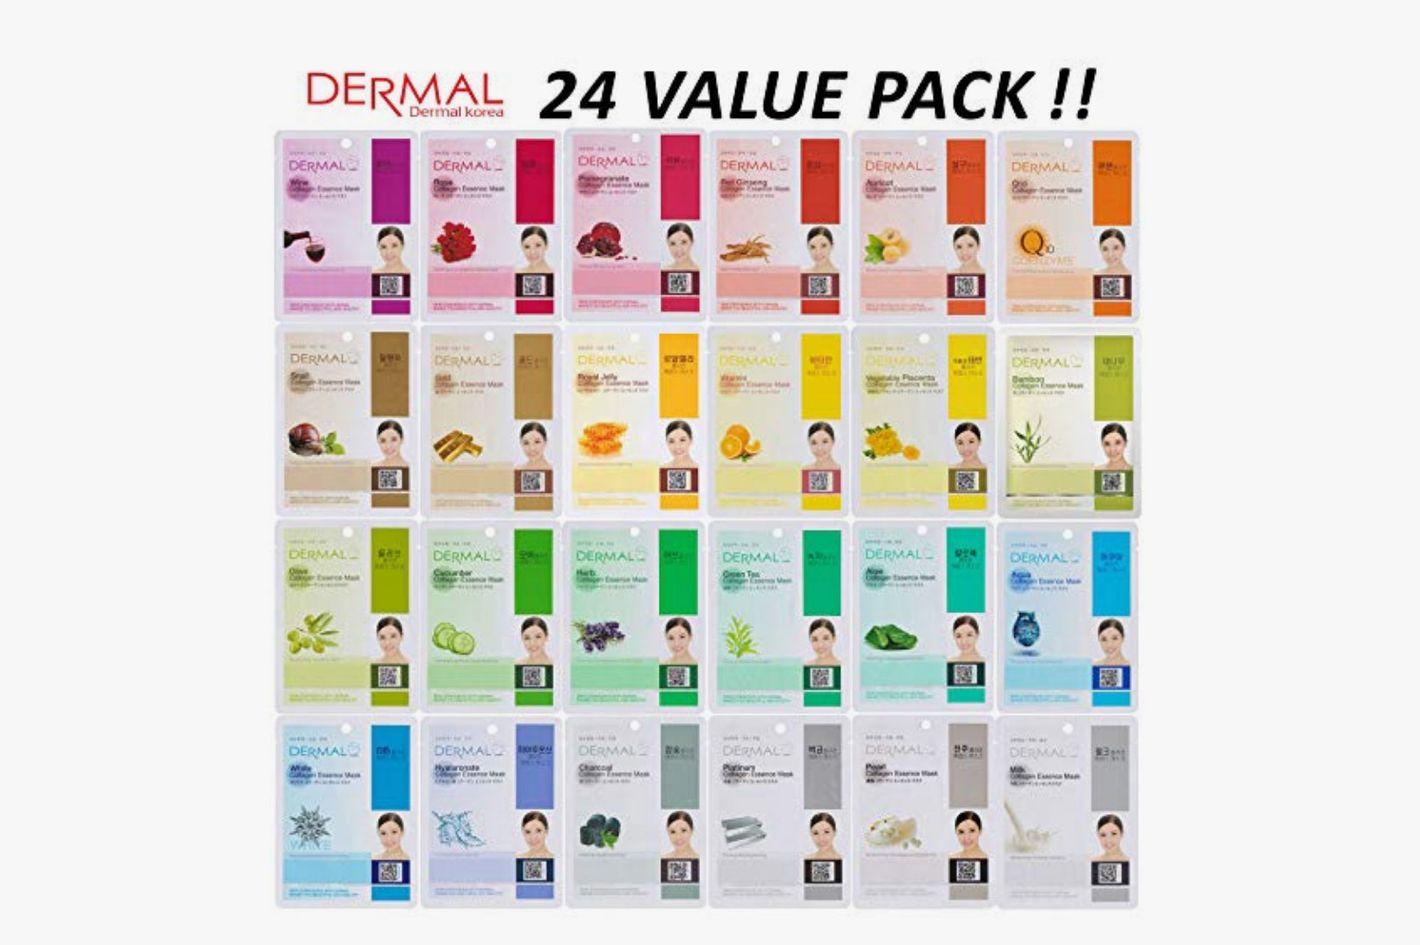 DERMAL 24 Combo Pack